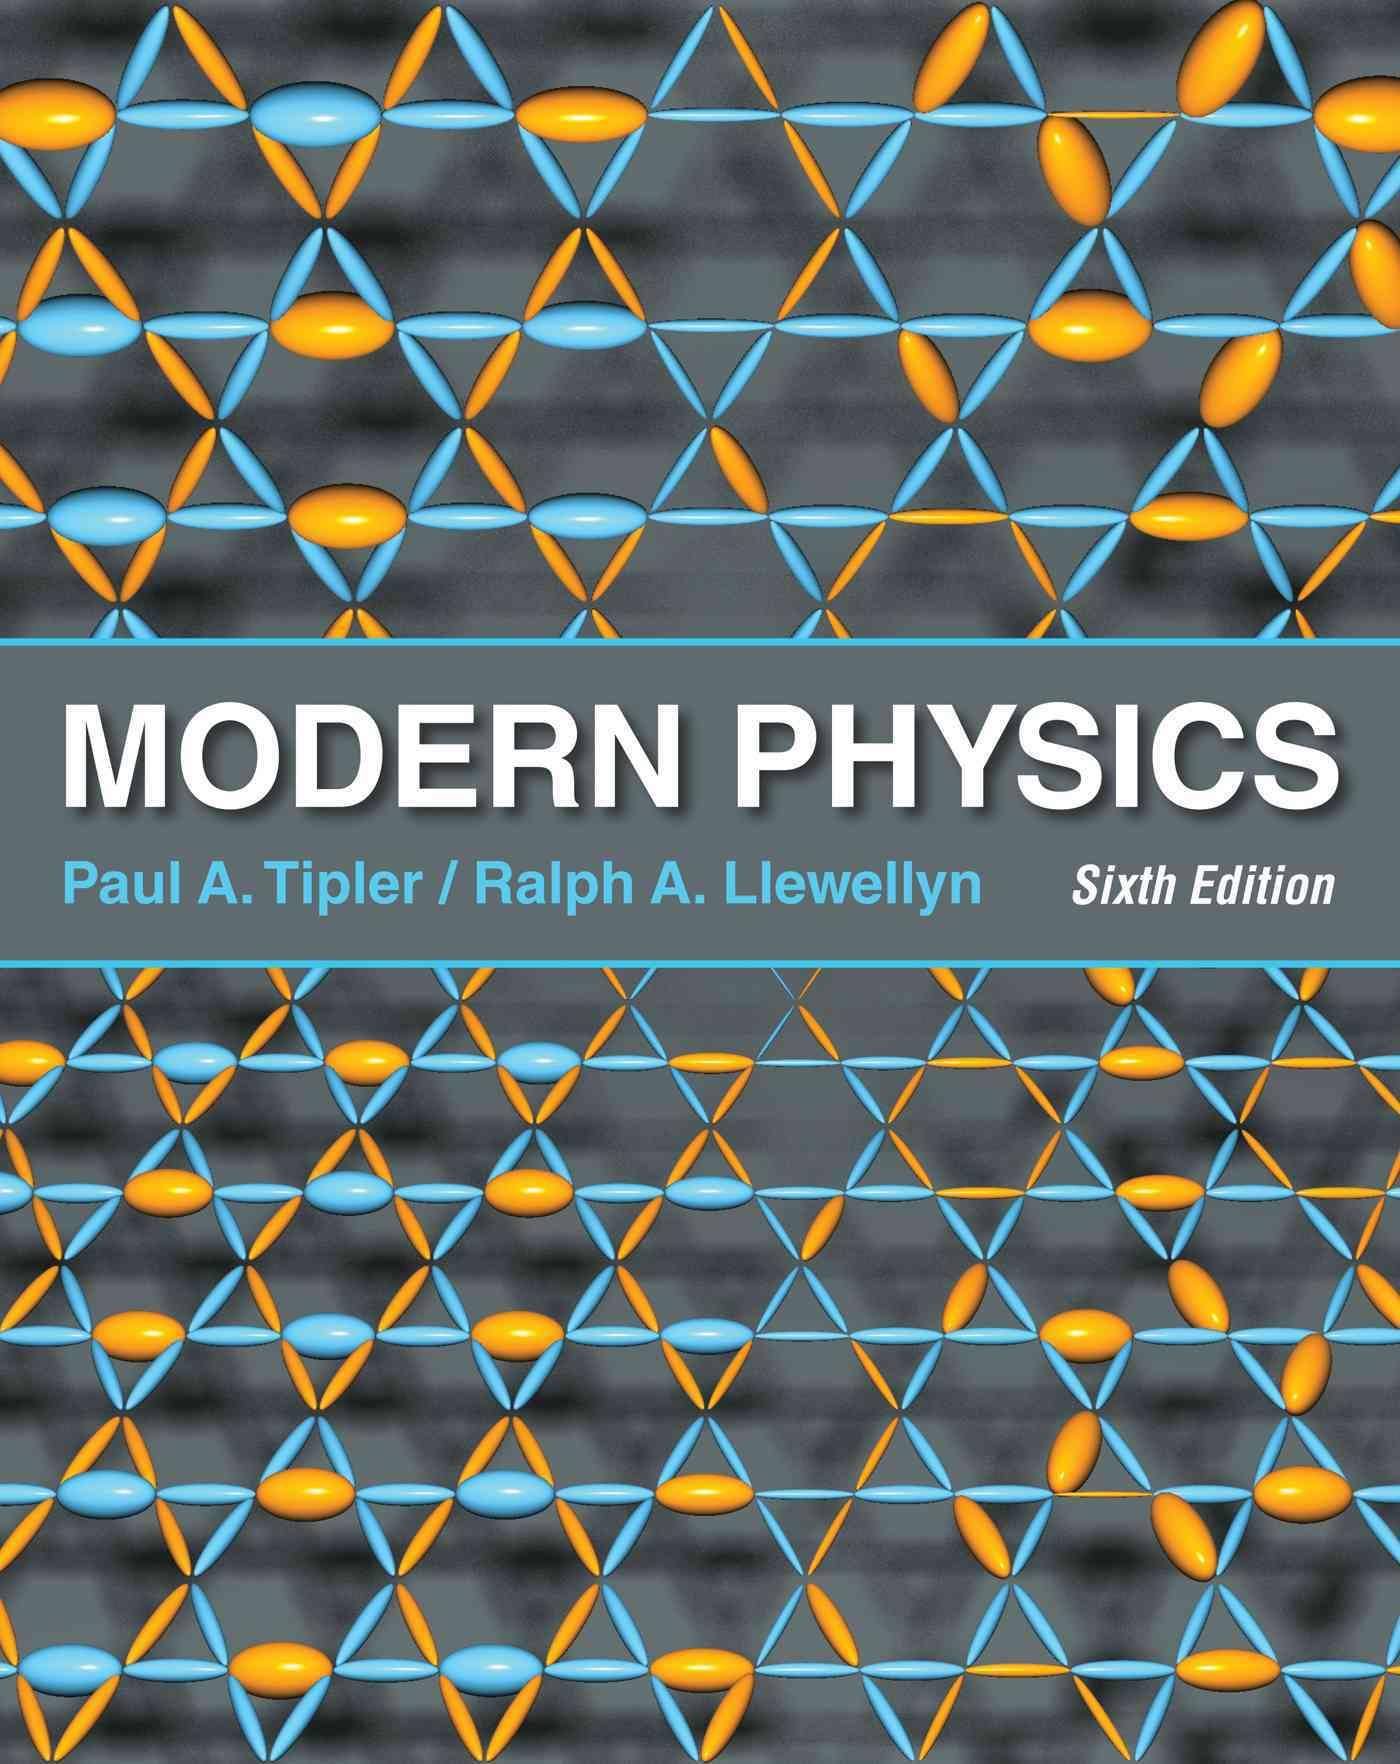 Modern Physics By Tipler, Paul A./ Llewellyn, Ralph